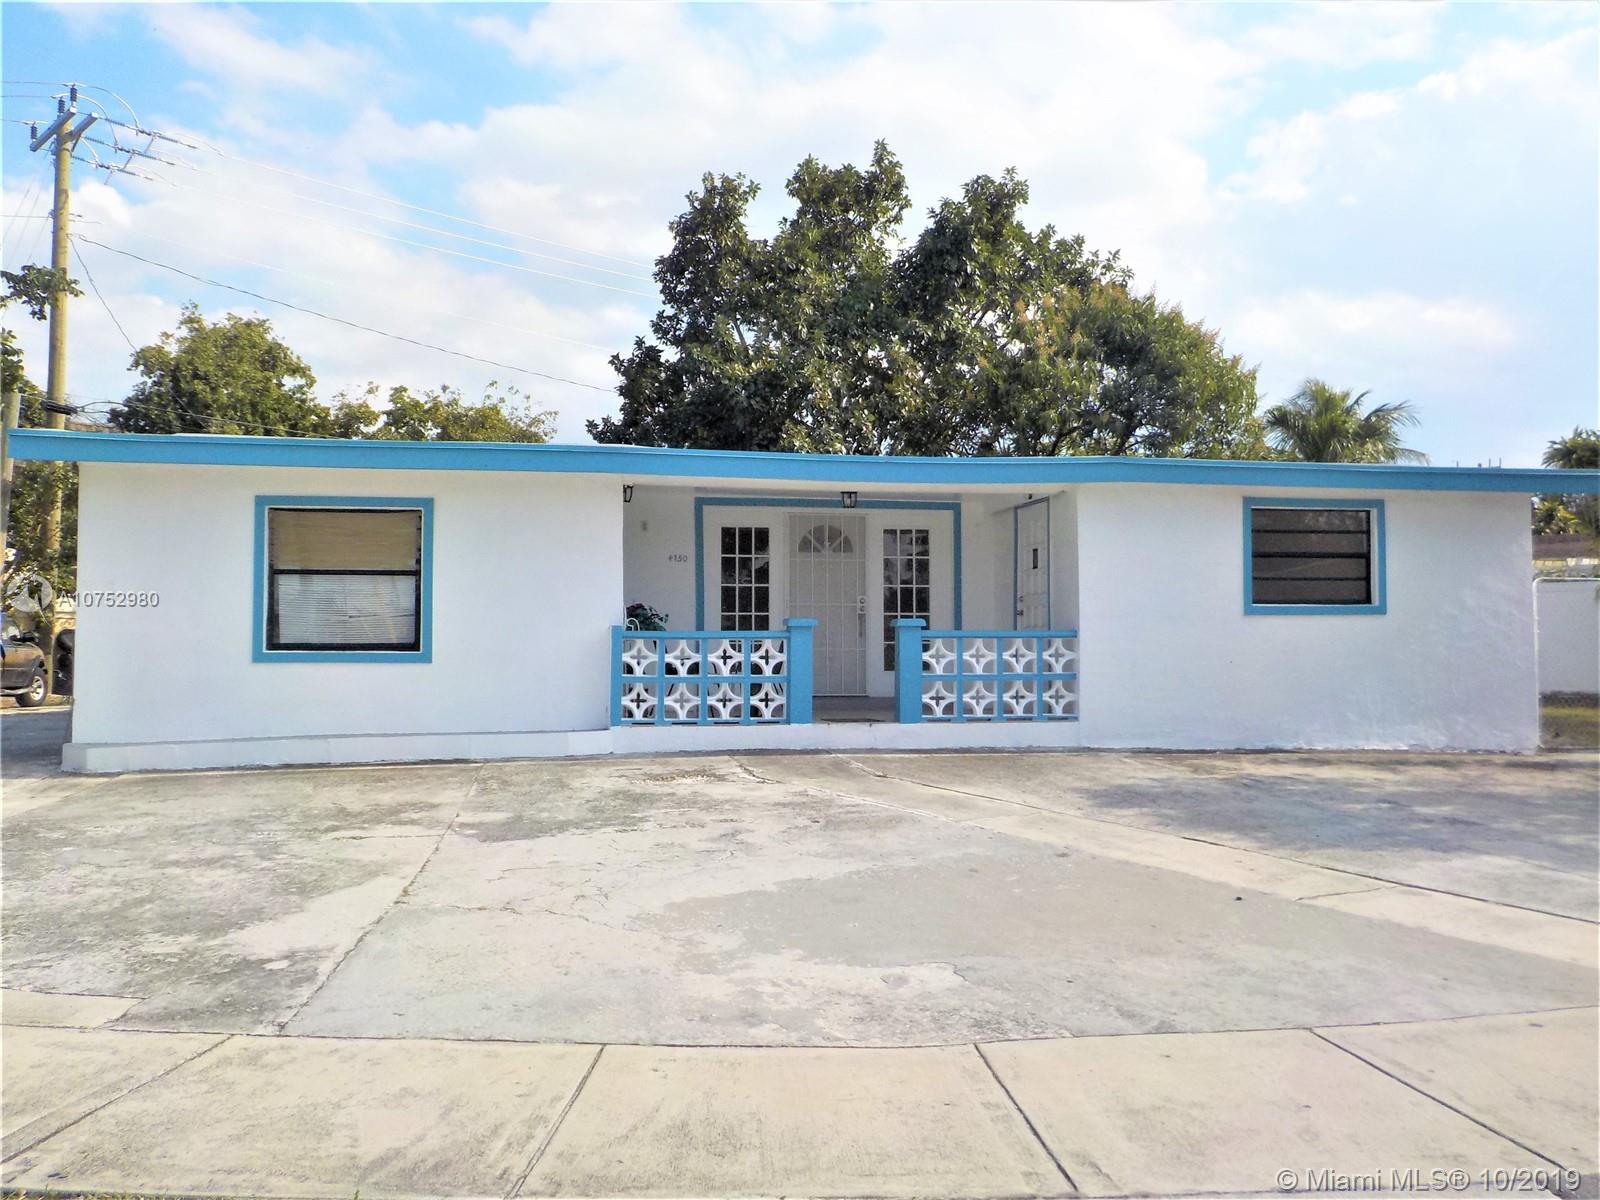 4750 NE 18th Ave #H, Pompano Beach, FL 33064 - Pompano Beach, FL real estate listing